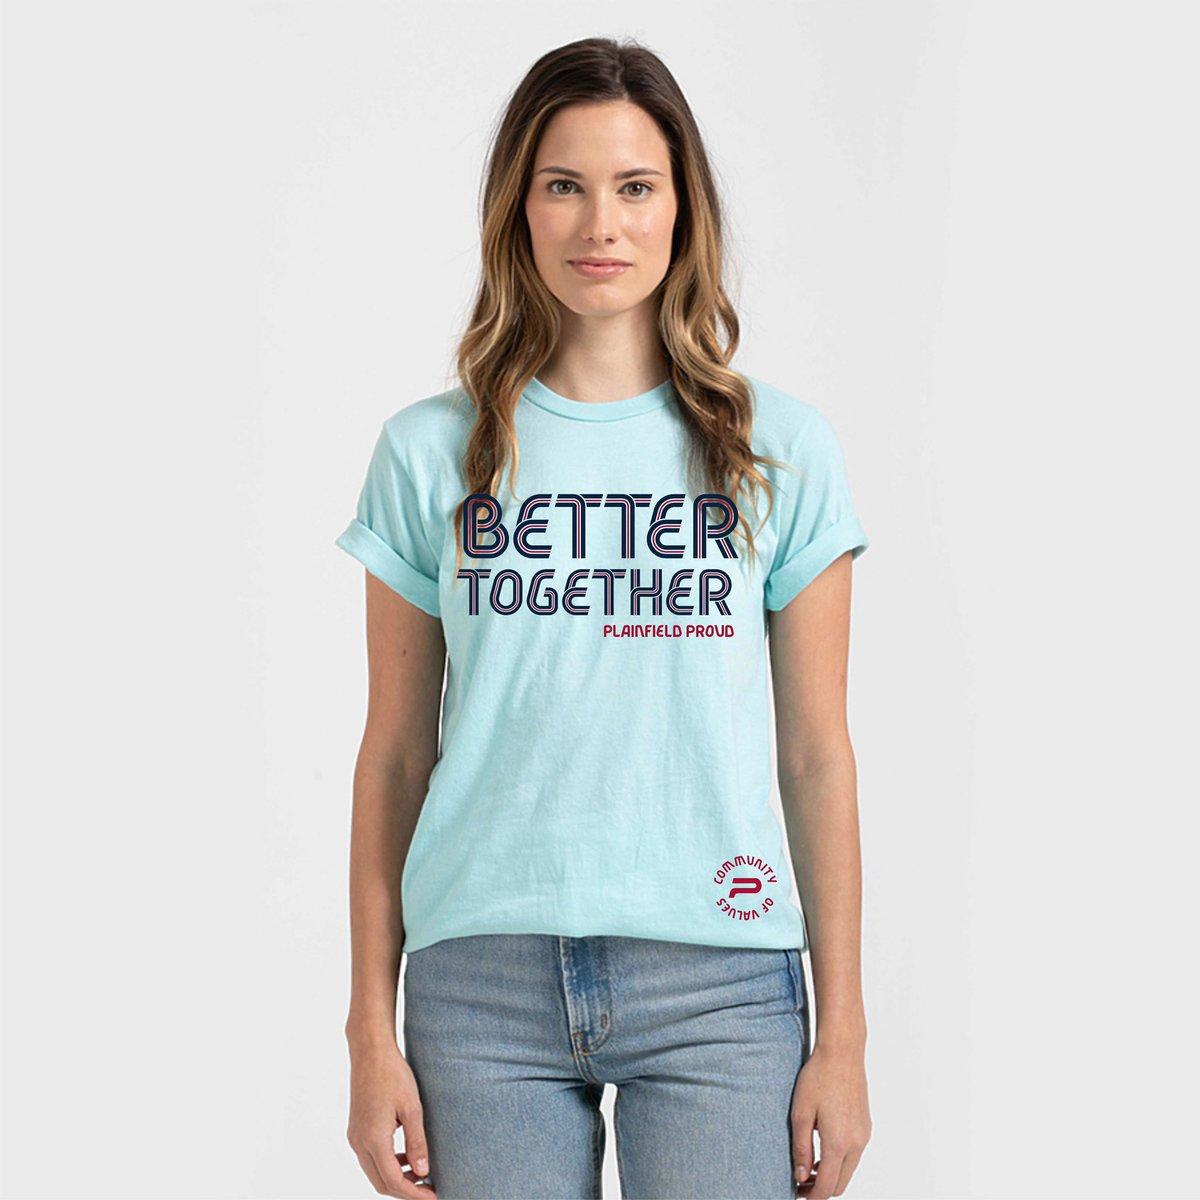 @TownPlainfield shows unity with 'Plainfield Proud' t-shirt sales.  Article with t-shirt link: https://t.co/rtHorbYWlN  #PlainfieldProud #PlainfieldIN #ALLinHendricksCounty https://t.co/rsbdCkJFCk